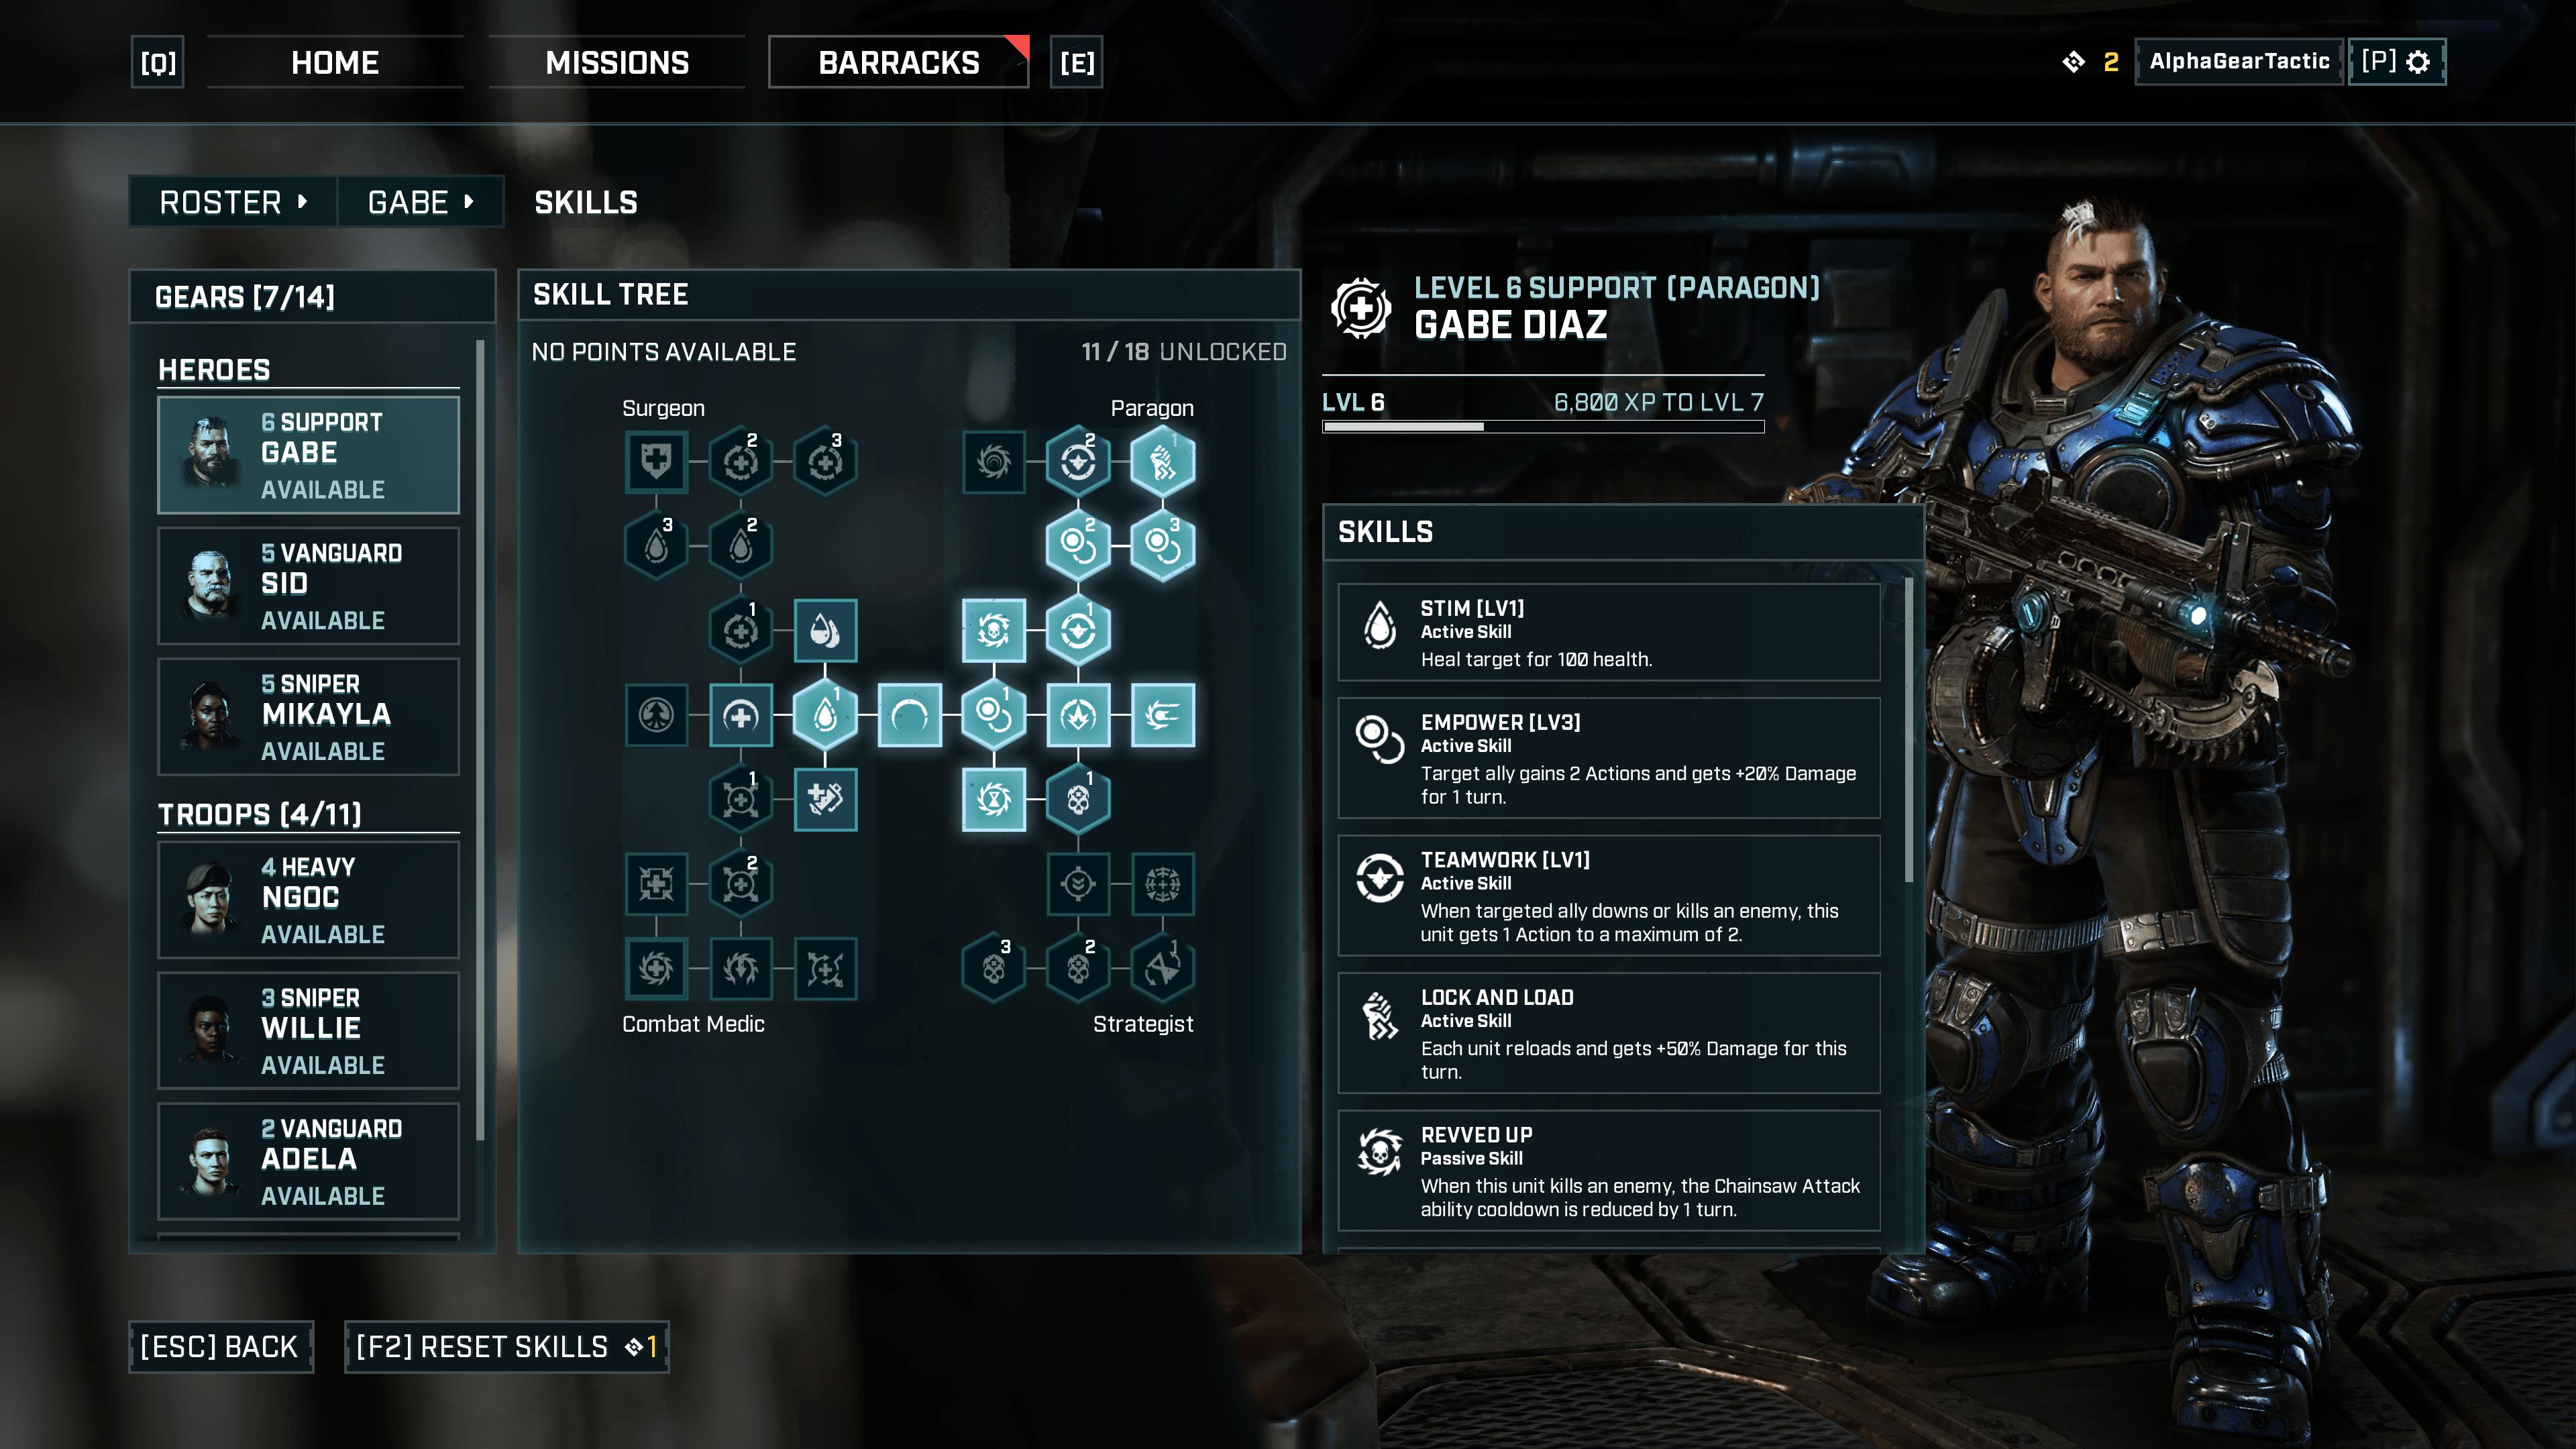 Les diverse progressions possibles d'une unité de support dans Gears Tactics